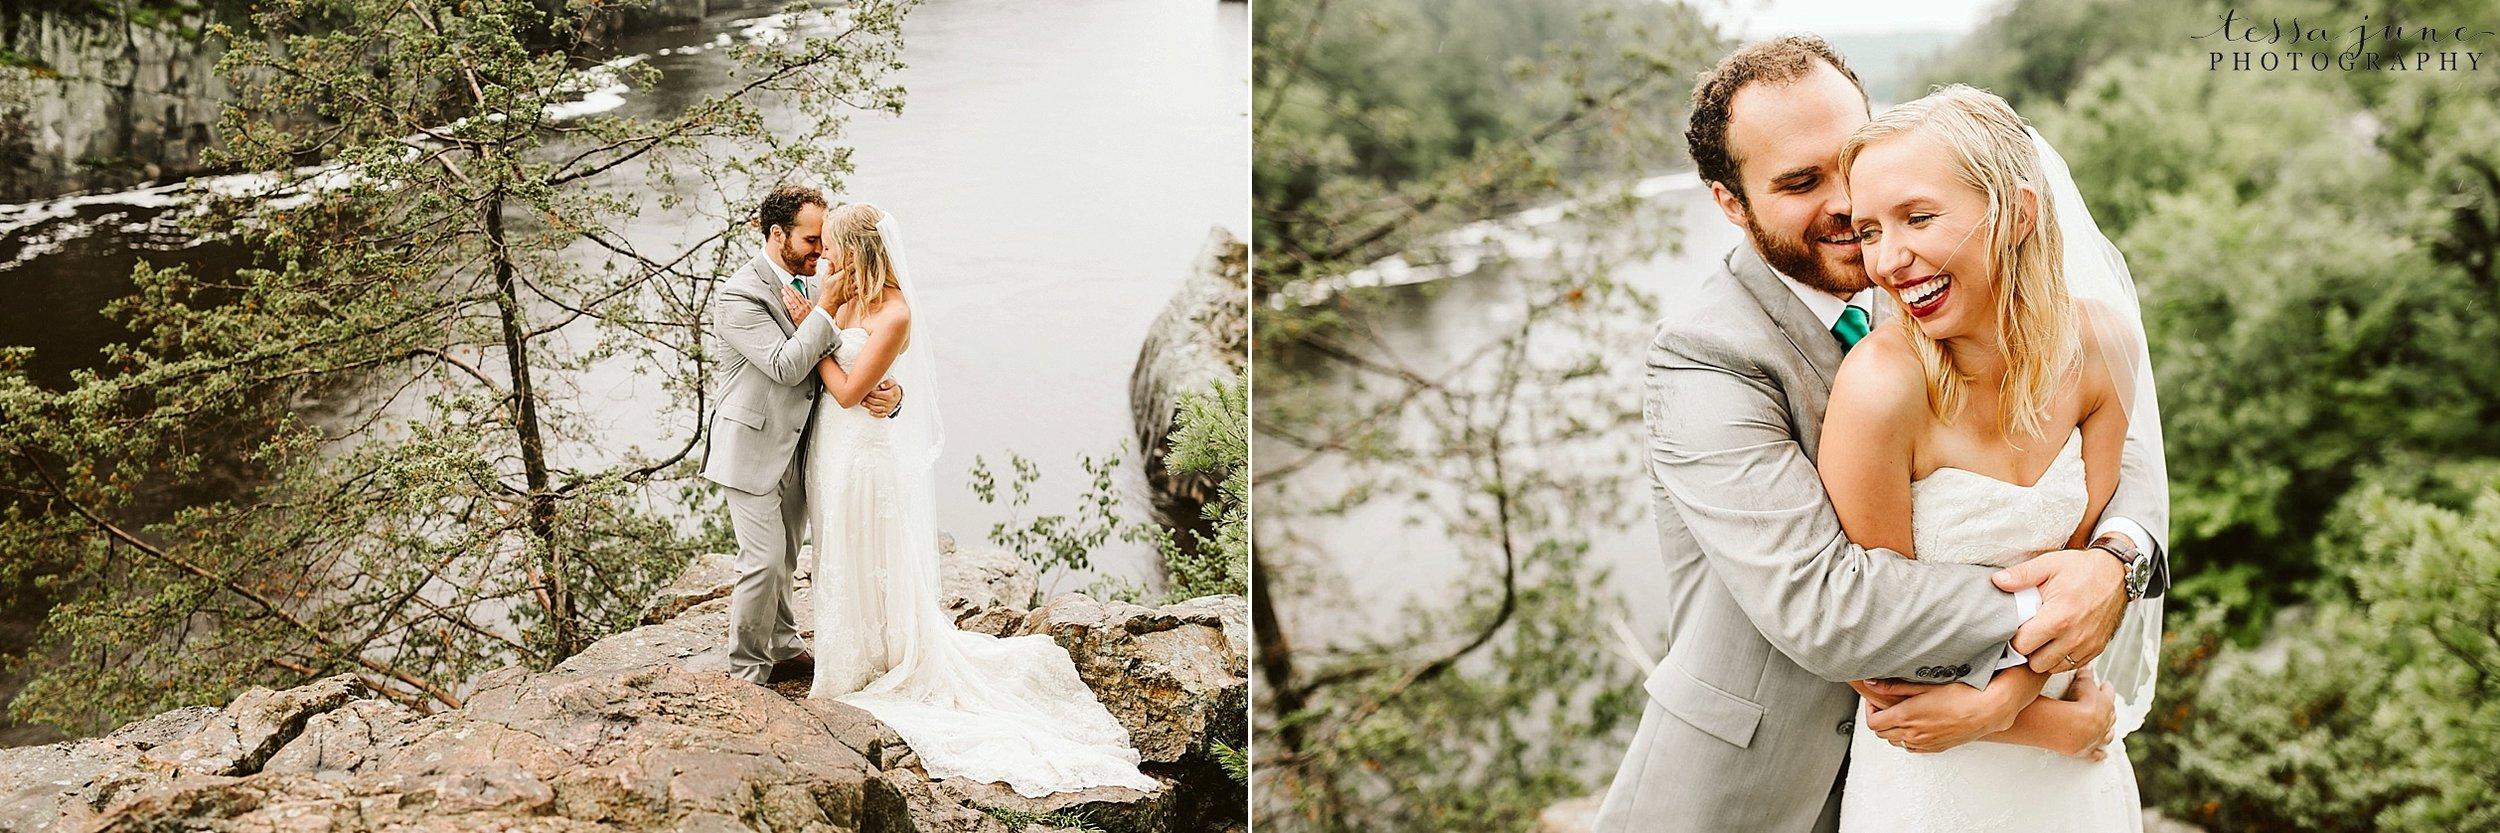 taylors-falls-rainy-elopement-wedding-interstate-state-park-89.jpg